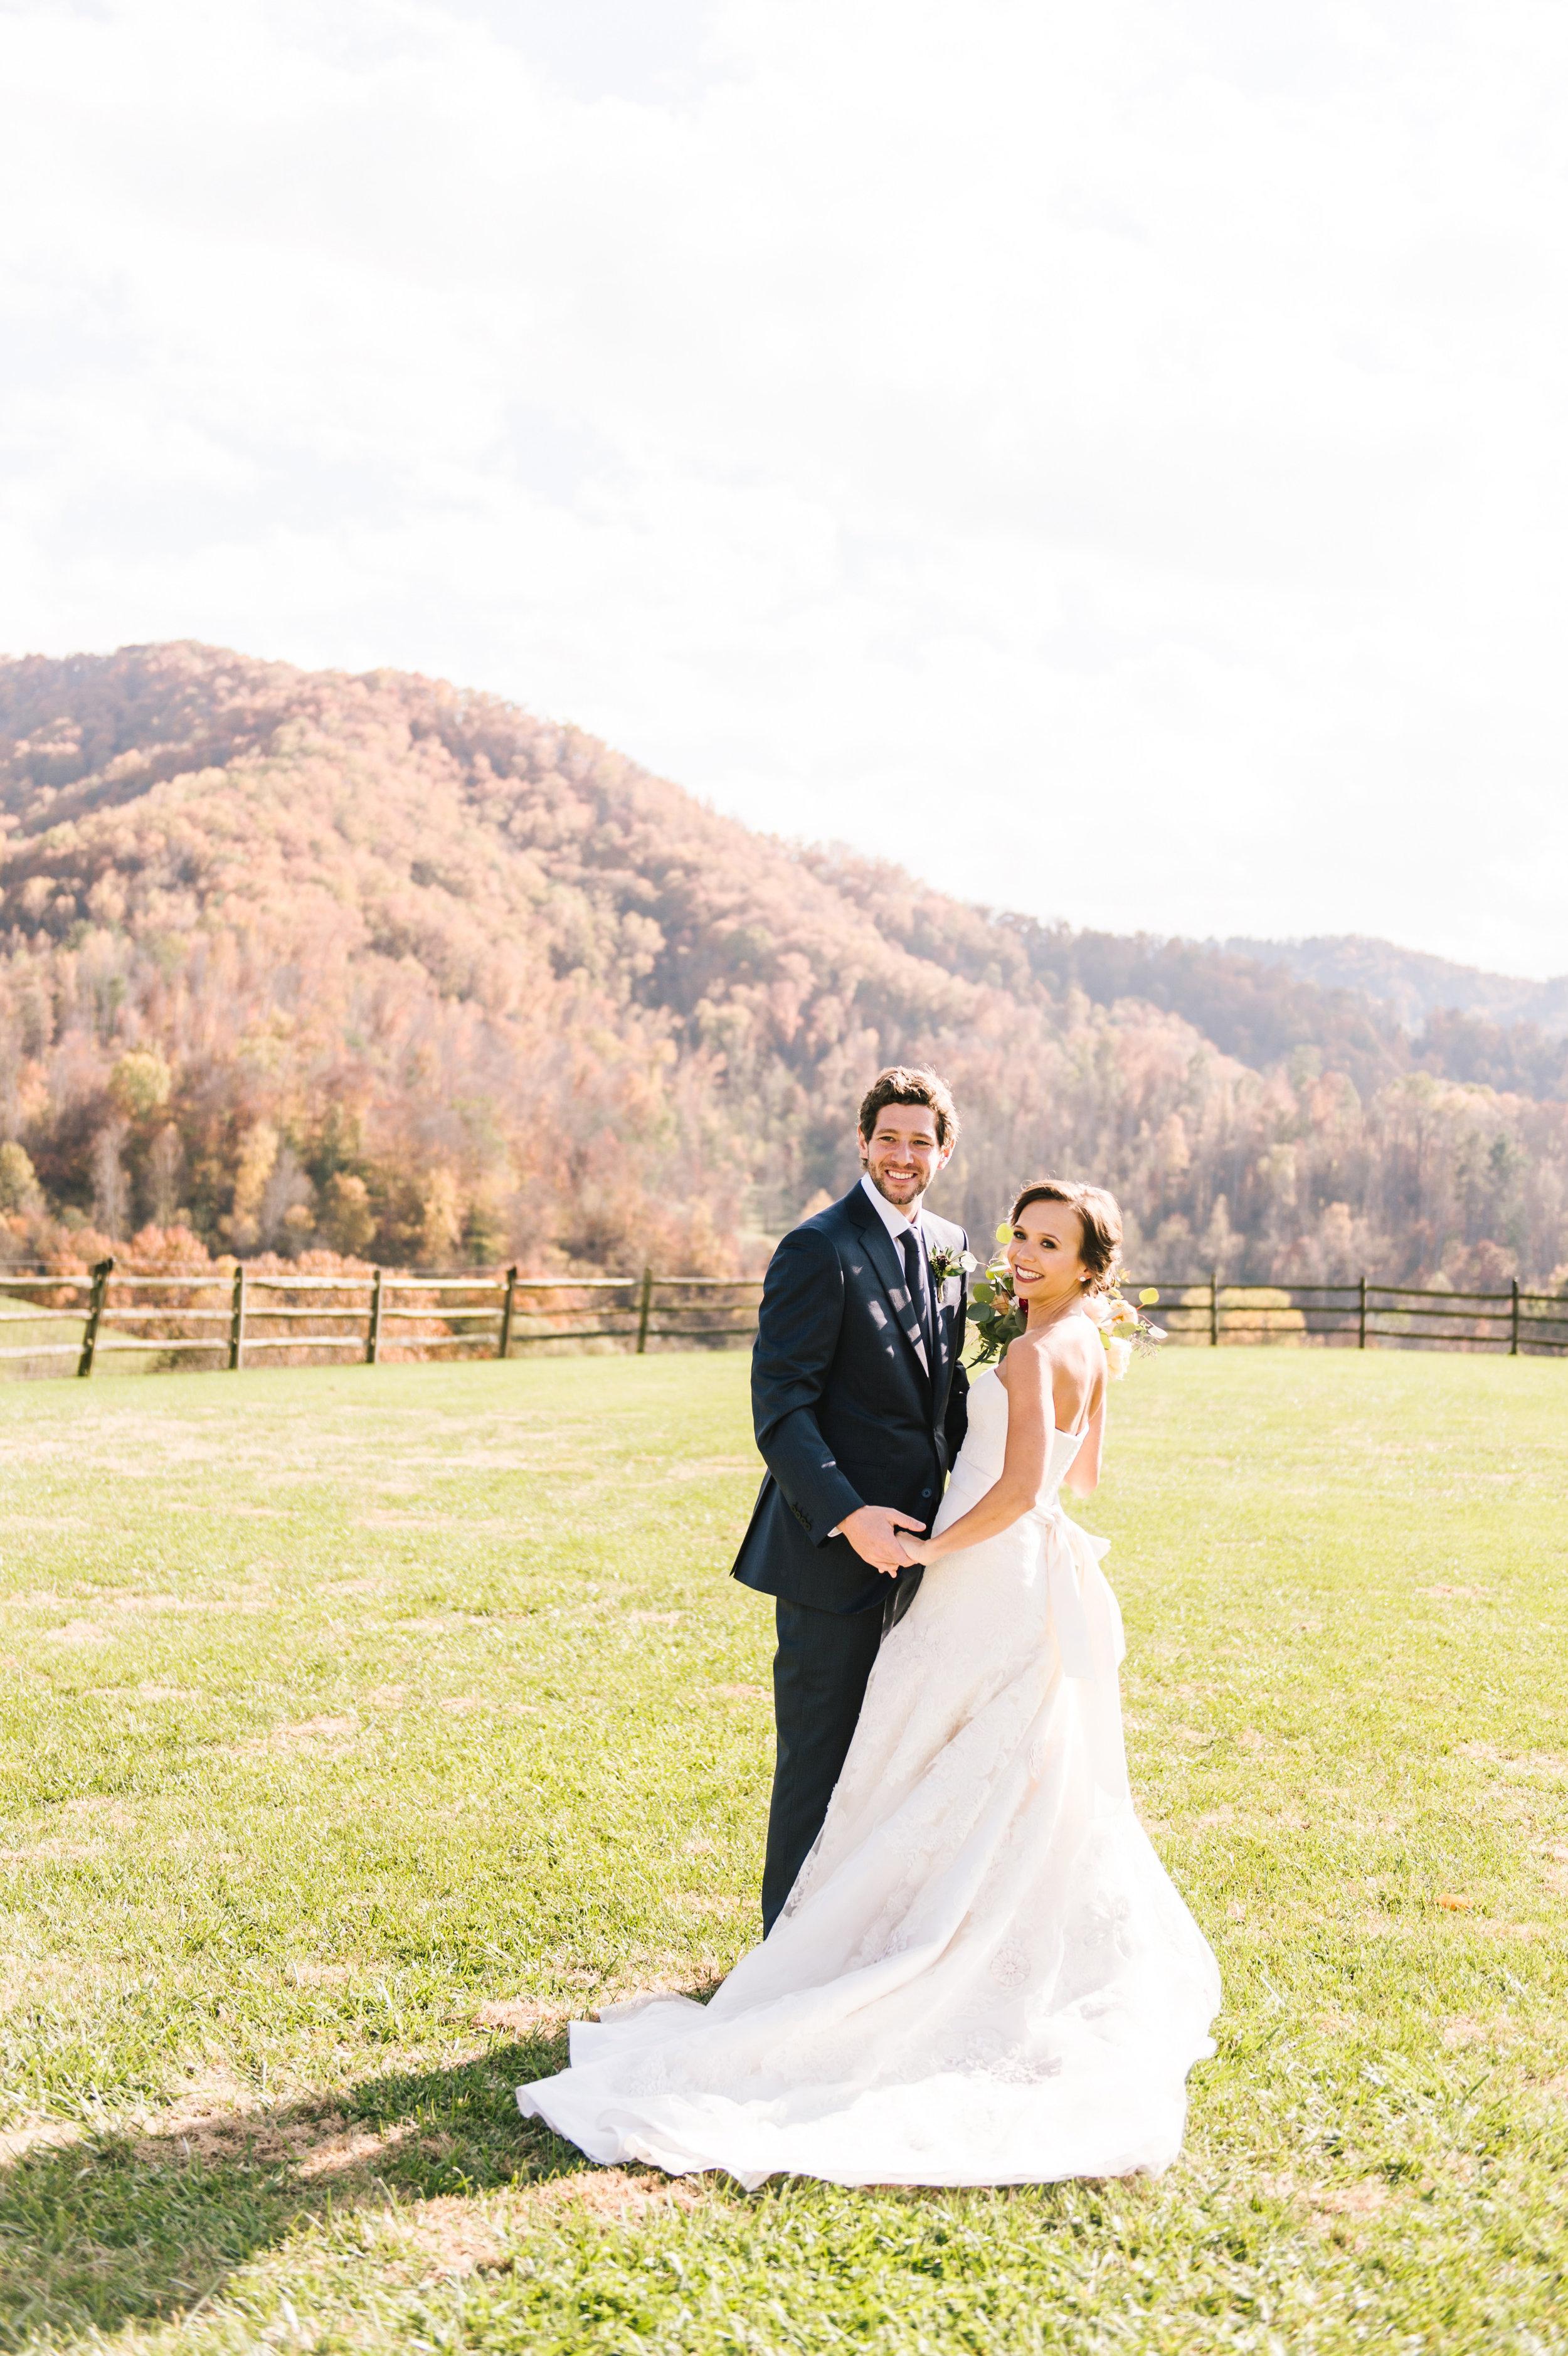 KatieStoopsPhotography-Asheville Wedding33.jpg